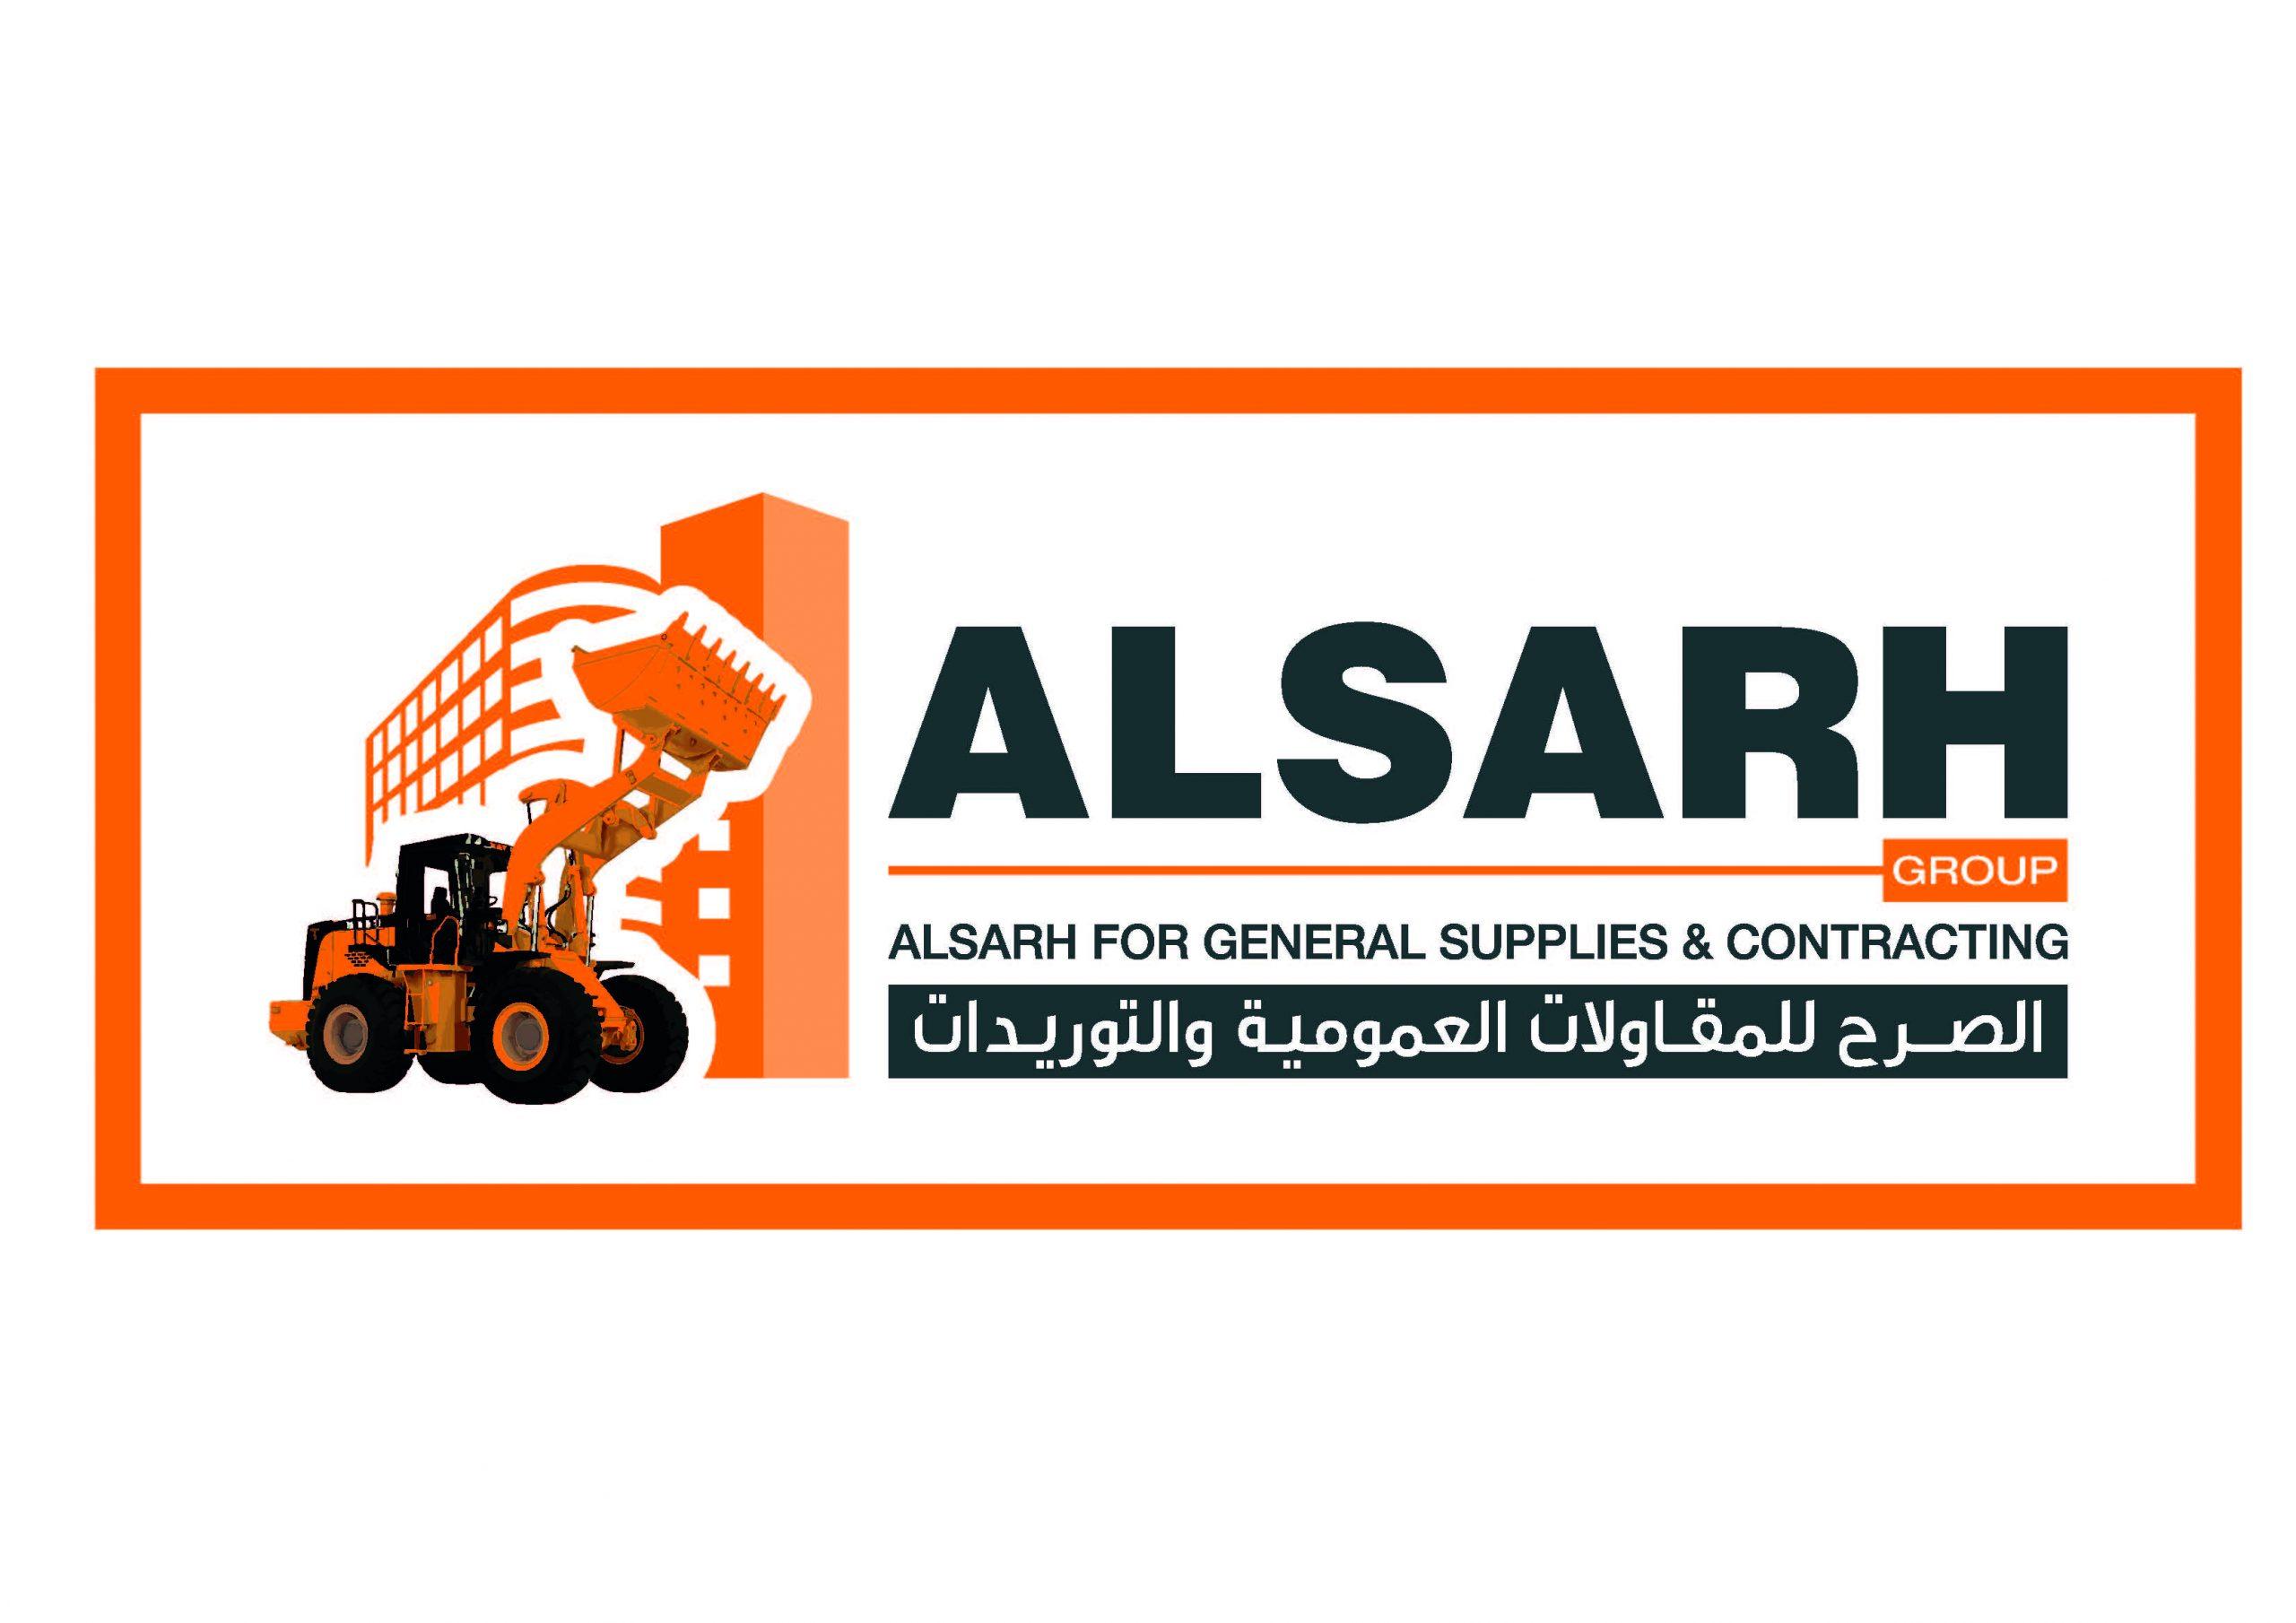 ALSARH FOR GENERAL SUPPLIES & CONTRACTING